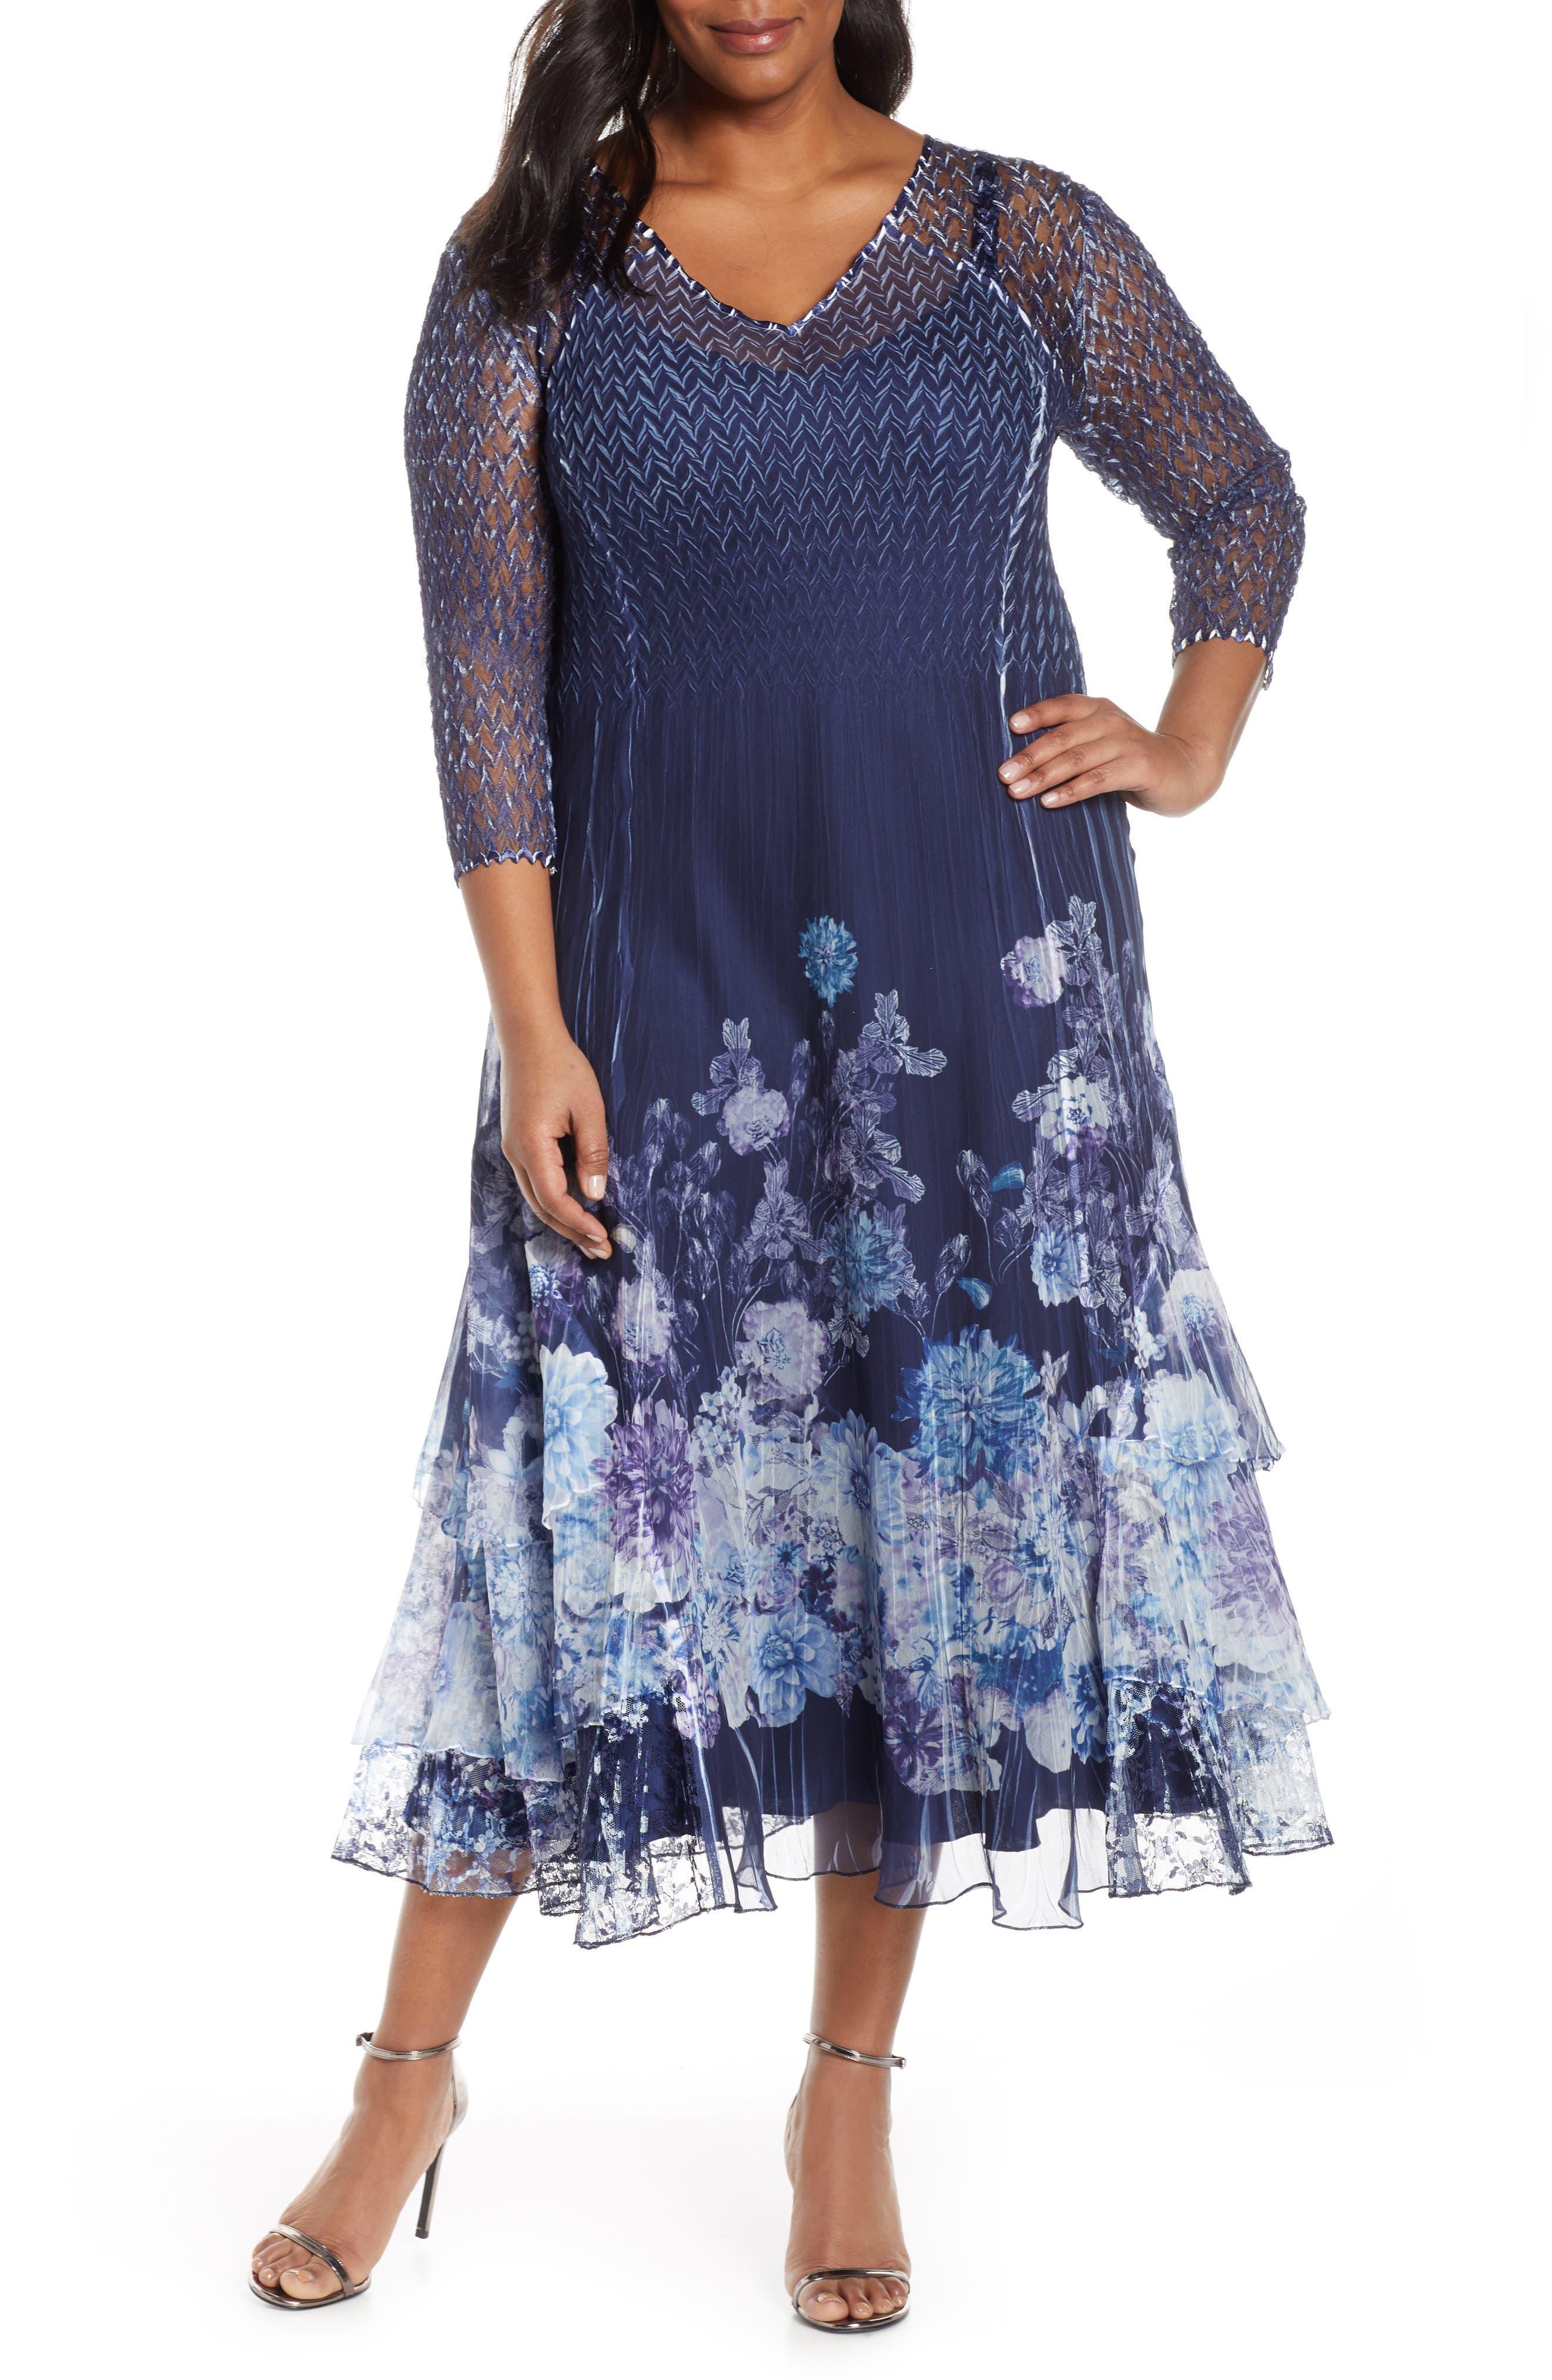 1930s Art Deco Plus Size Dresses | Tea Dresses, Party Dresses Plus Size Womens Komarov Print Chiffon A-Line Midi Dress $389.00 AT vintagedancer.com